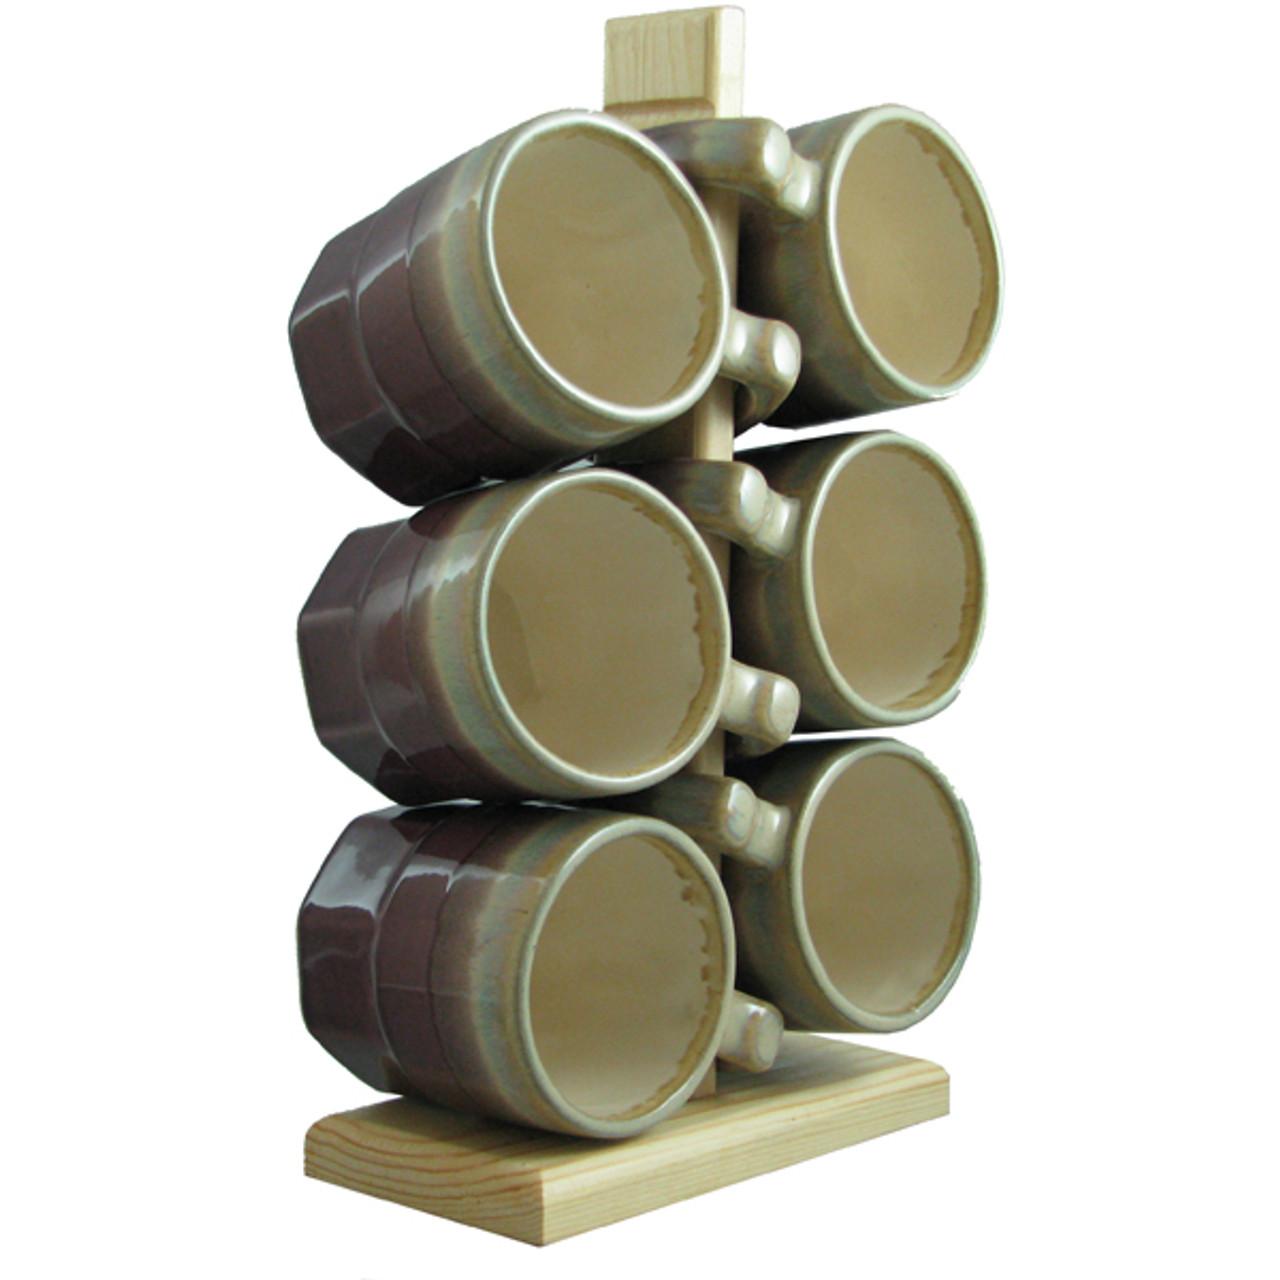 Padilla Traditional, 16oz Mugs - Set of 6